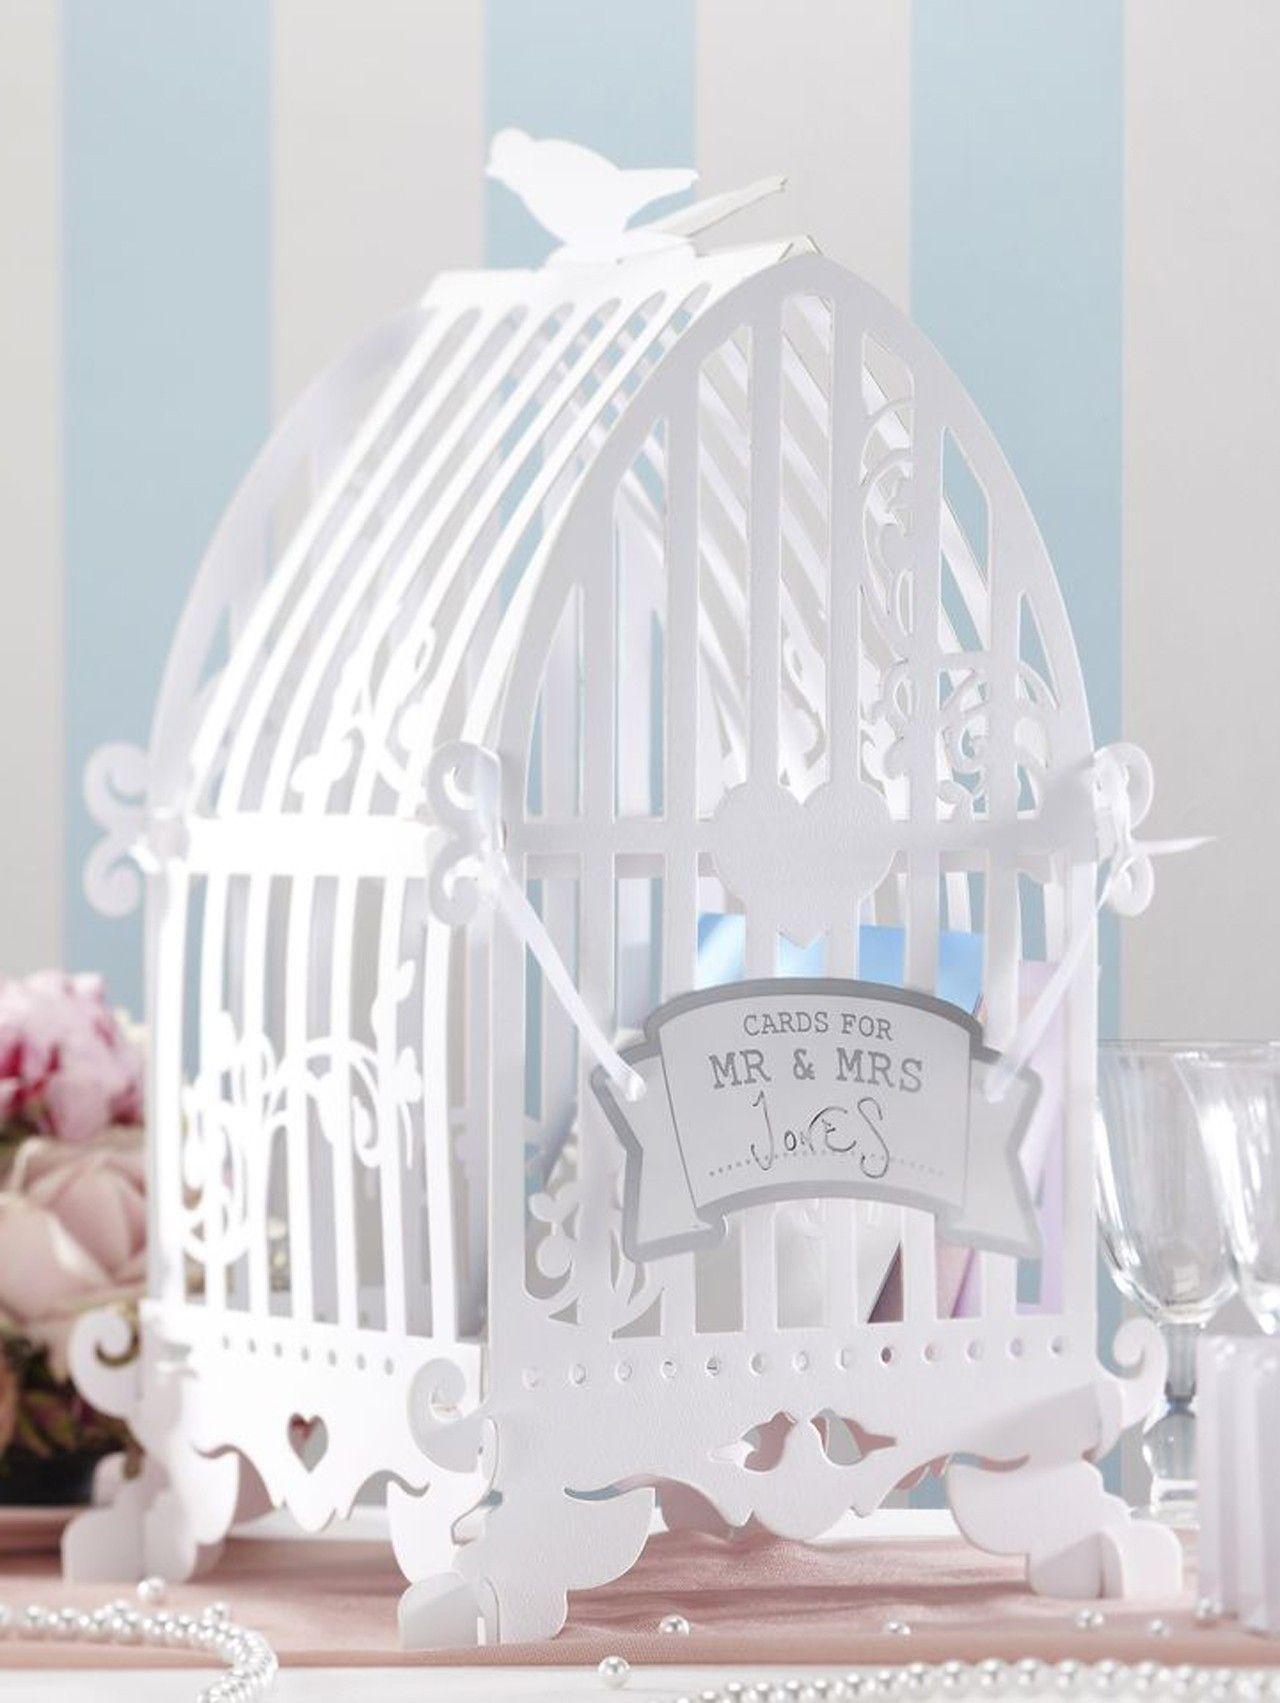 White Birdcage Wedding Postbox | Birdcages | Pinterest | Birdcage ...